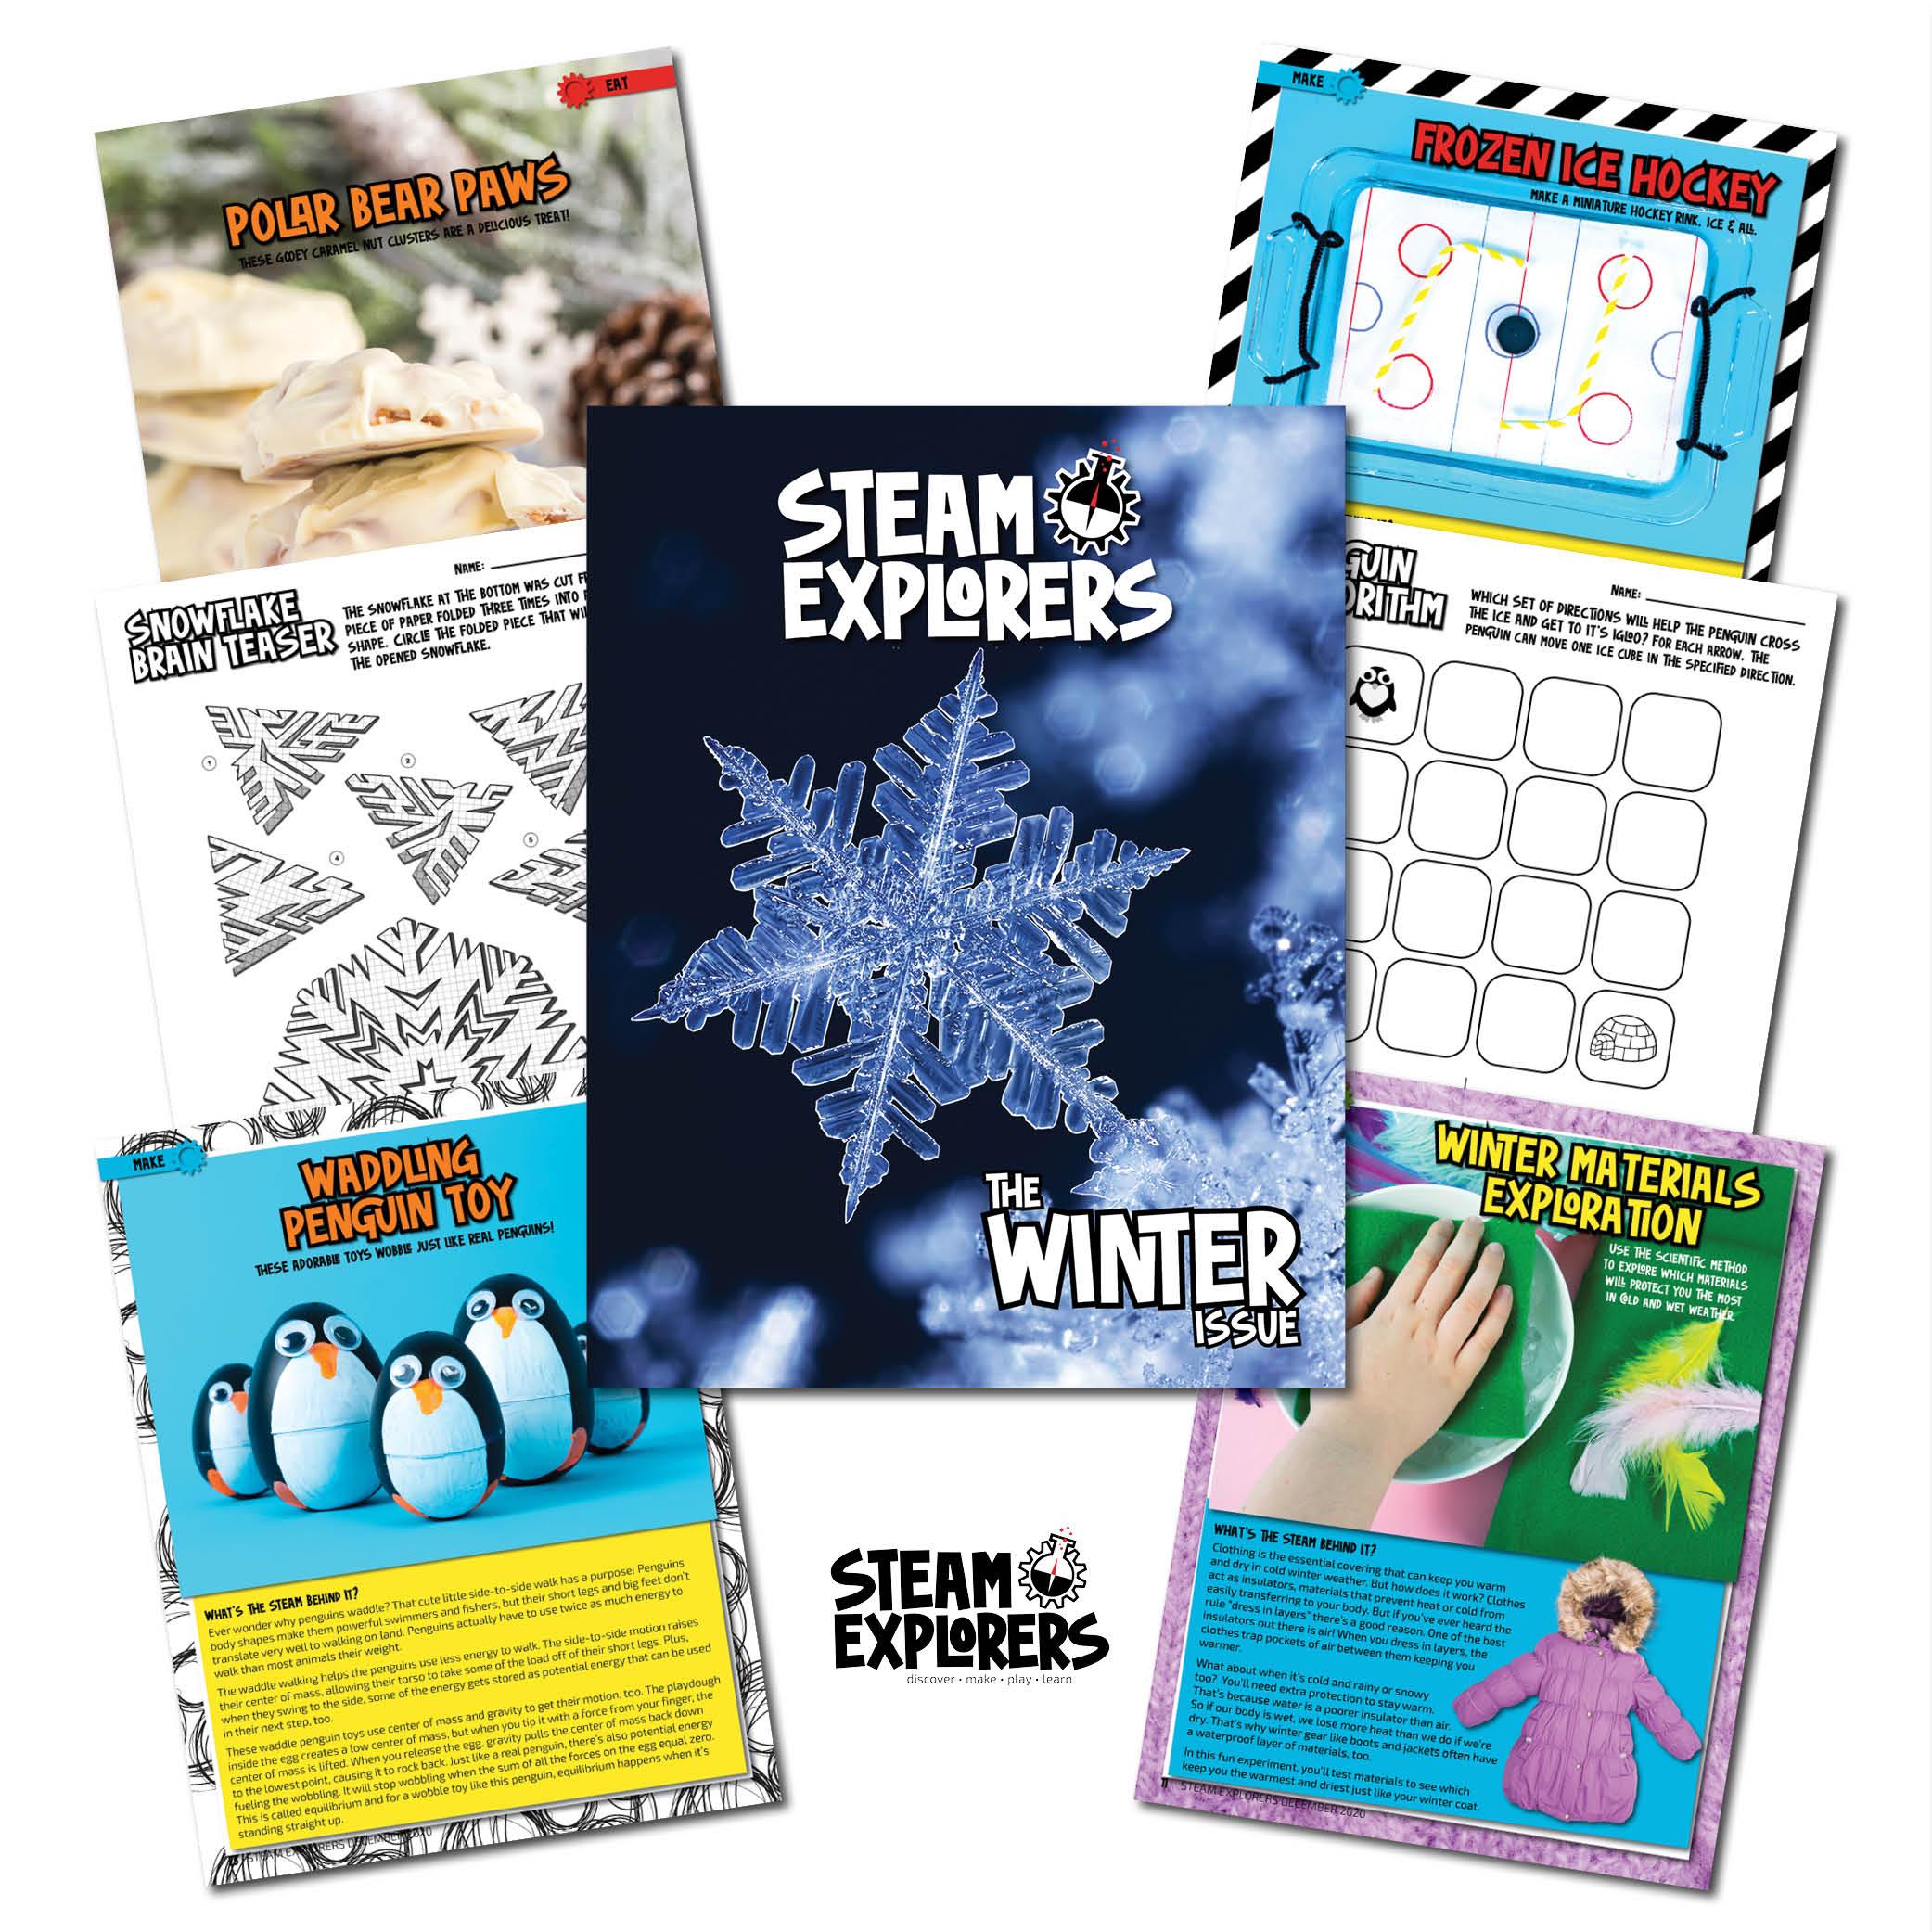 STEAM Explorers Winter Collage 1000x1000